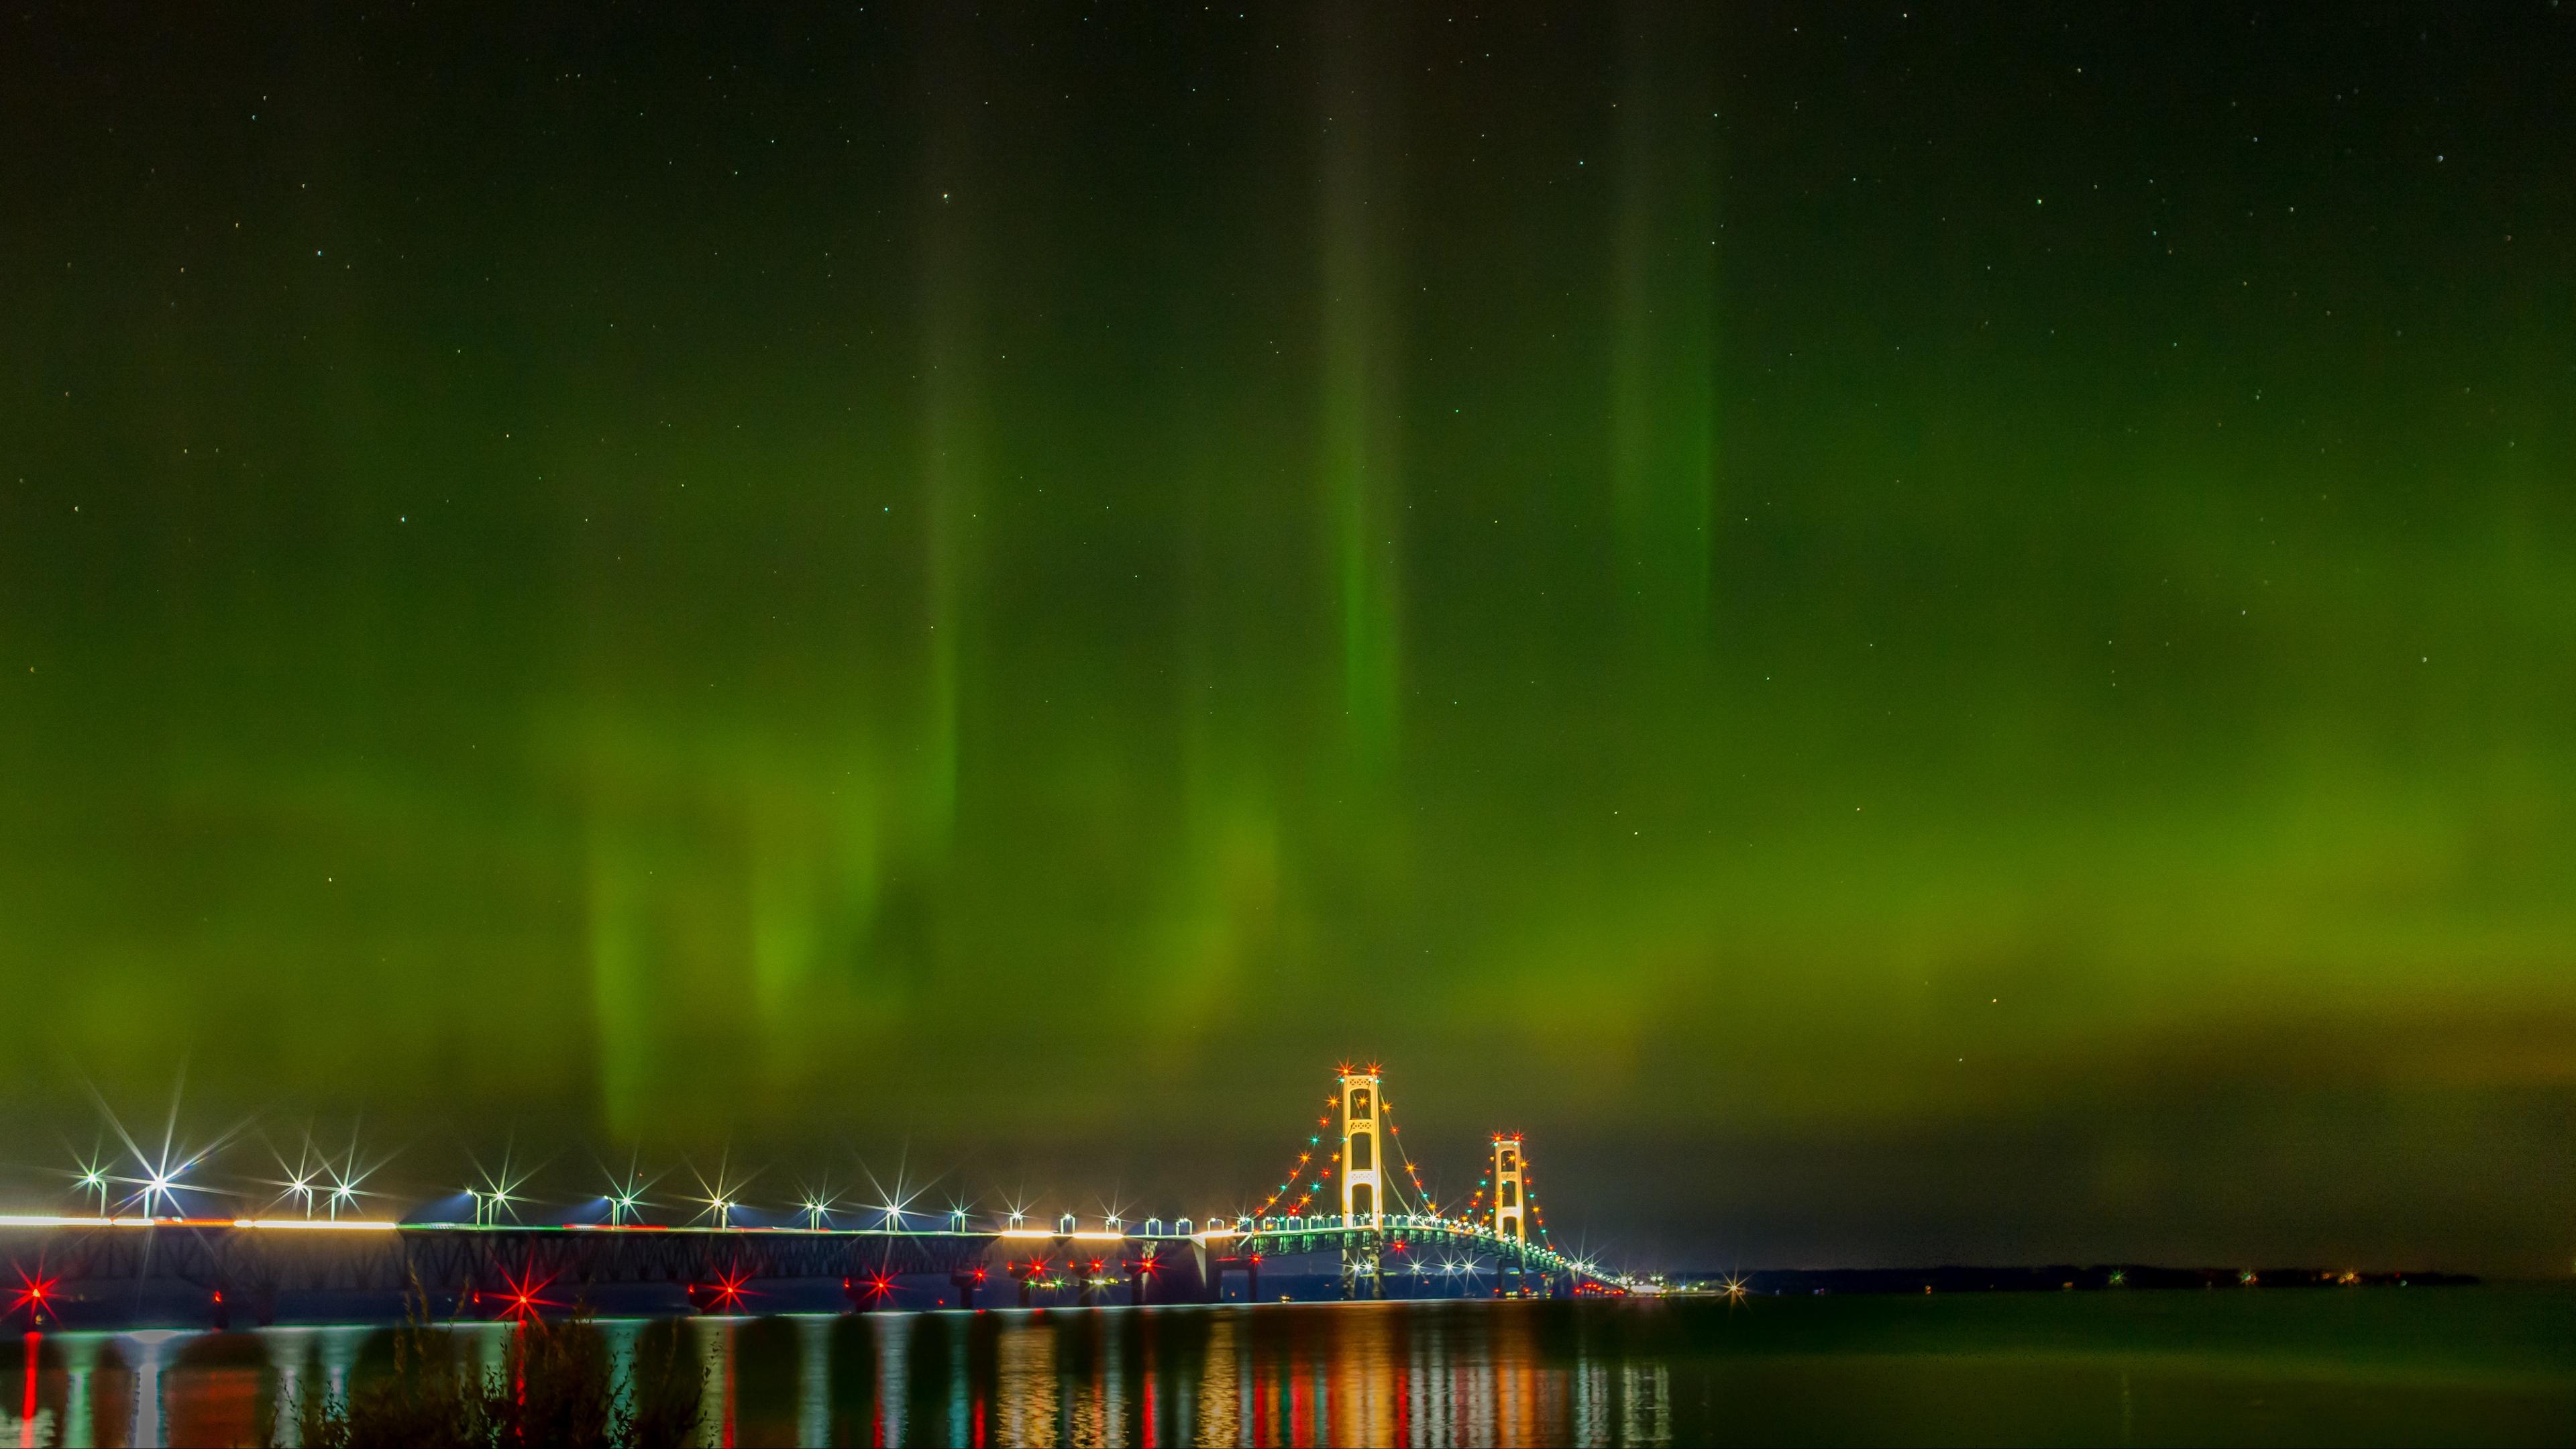 northern lights aurora bridge night michigan usa 4k 1538067576 - northern lights, aurora, bridge, night, michigan, usa 4k - northern lights, bridge, Aurora